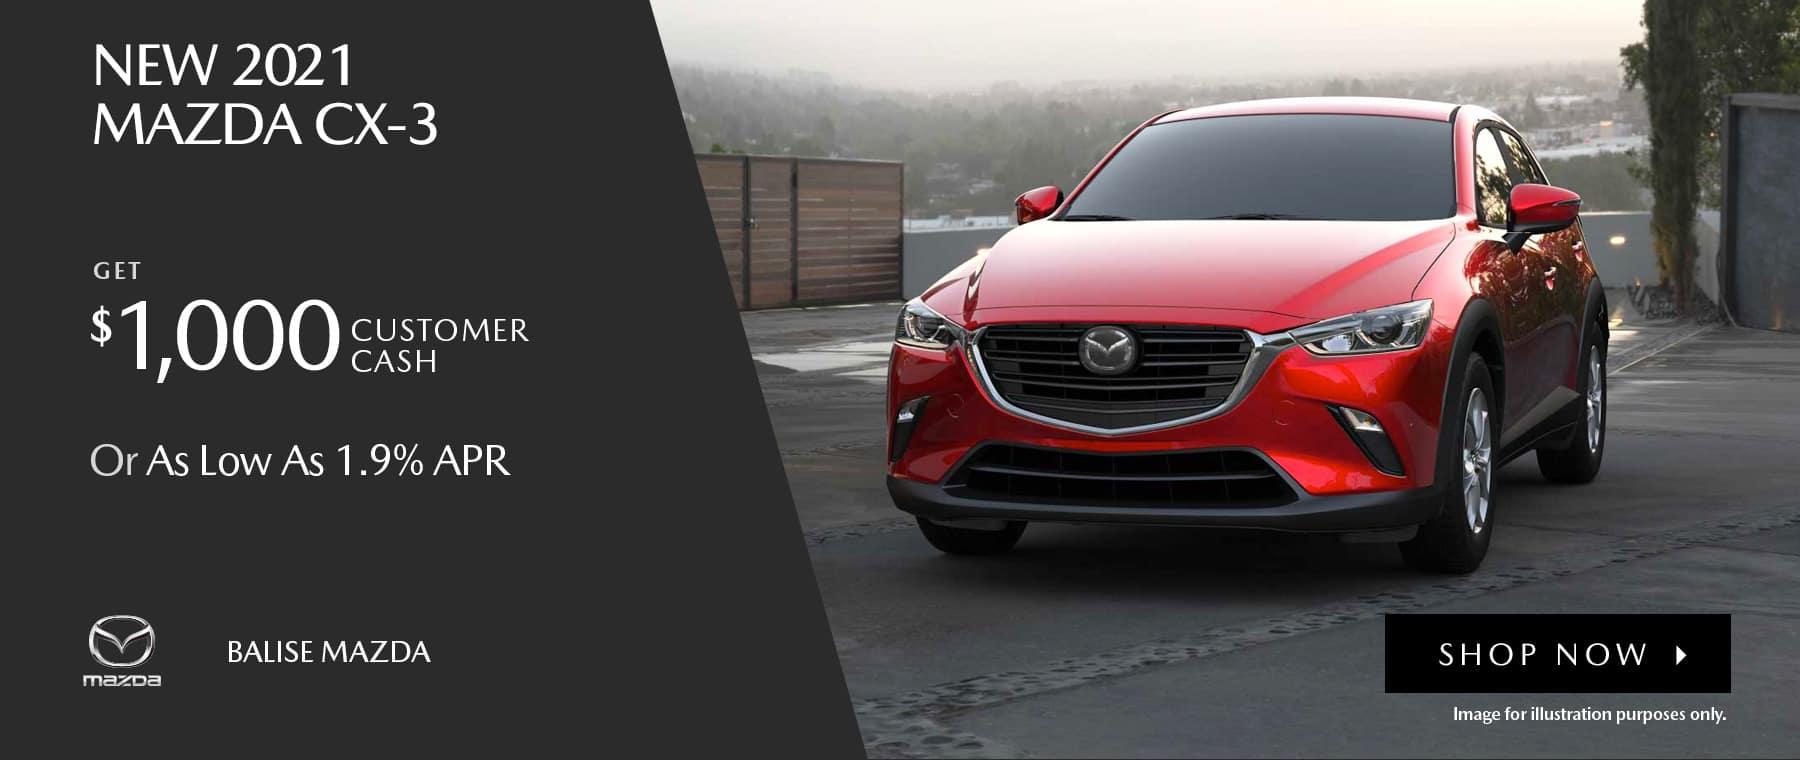 BMAZ-HomePageBanner-1800×760-New 2021 Mazda CX-3 _07'21